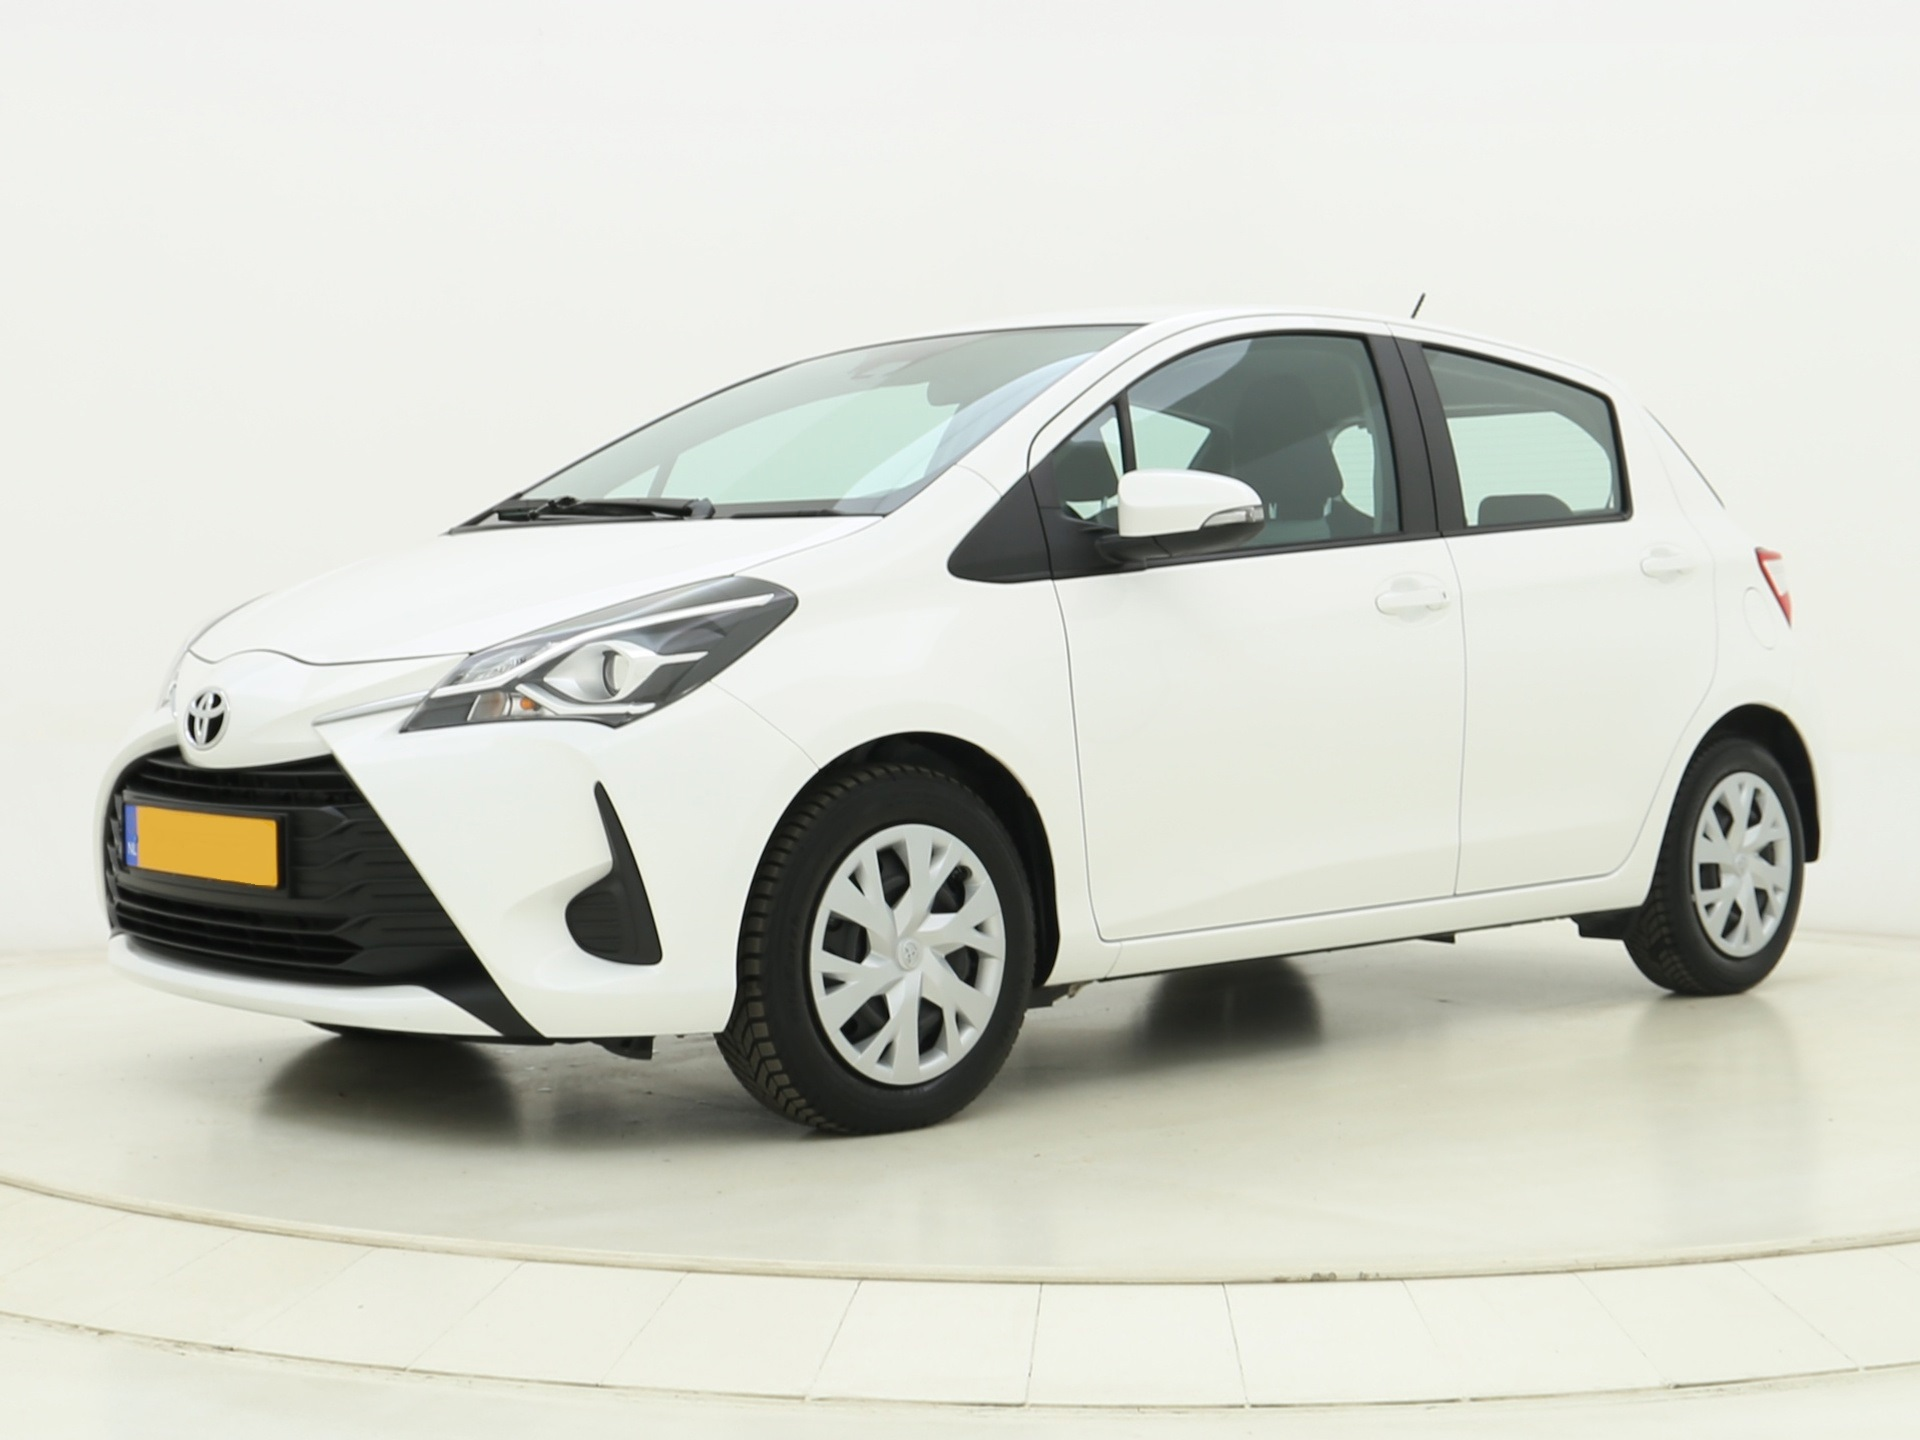 Toyota Yaris 1.5 Vvt-I Active Automaat